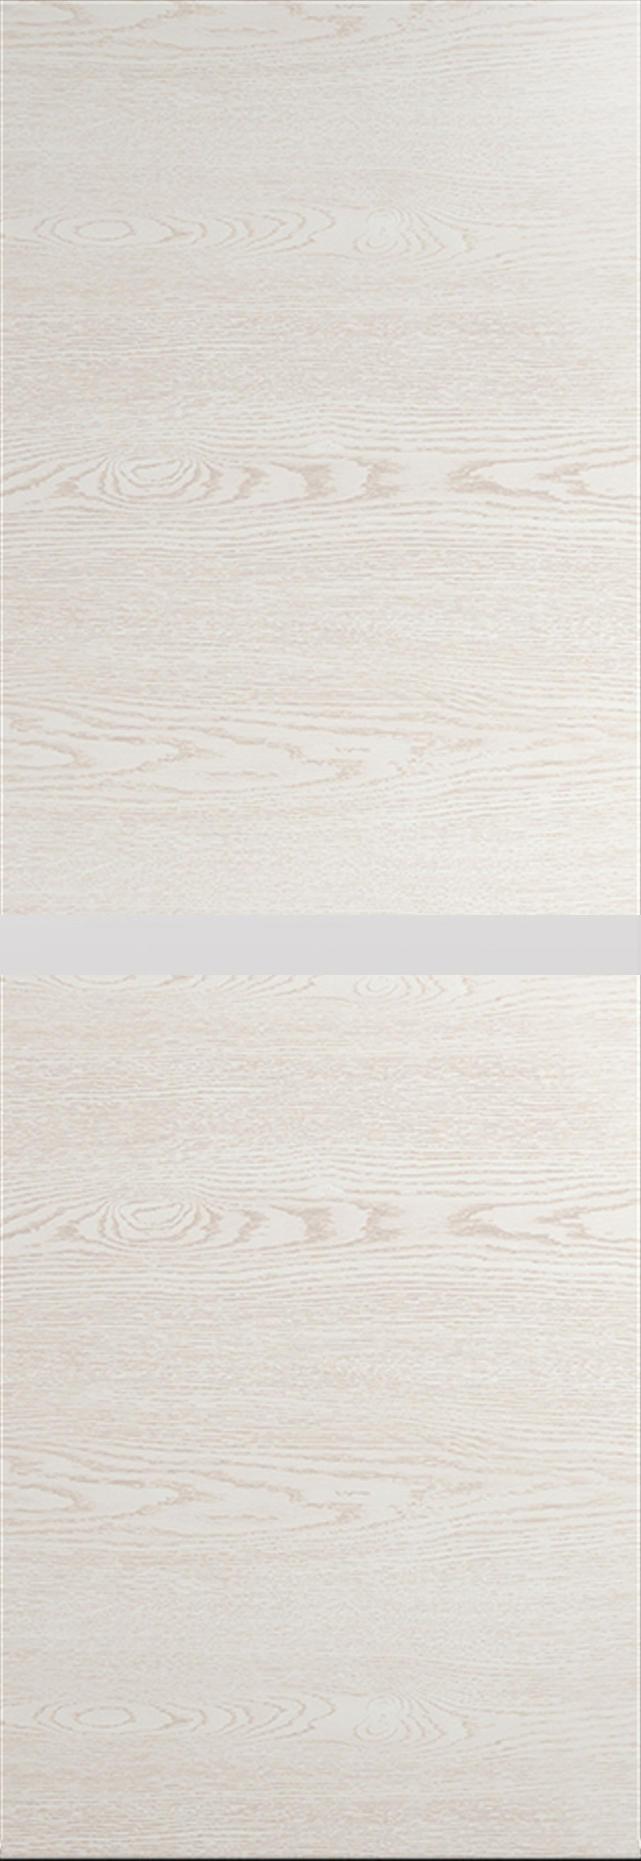 Tivoli Б-4 Invisible цвет - Белый ясень Без стекла (ДГ)